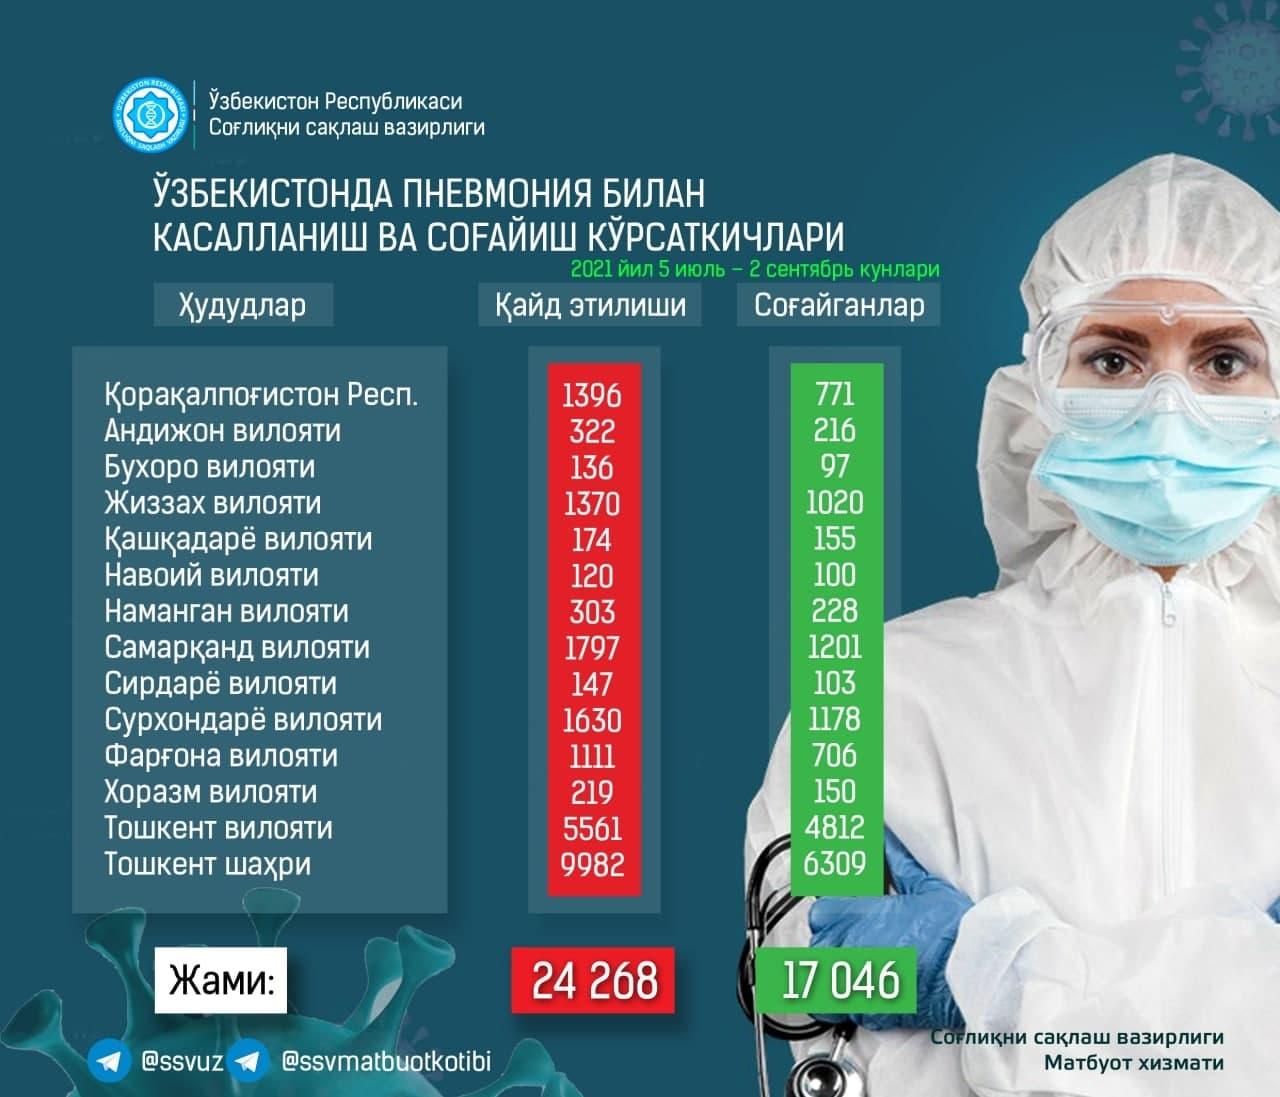 За сутки меньше 100 человек заразились пневмонией — статистика